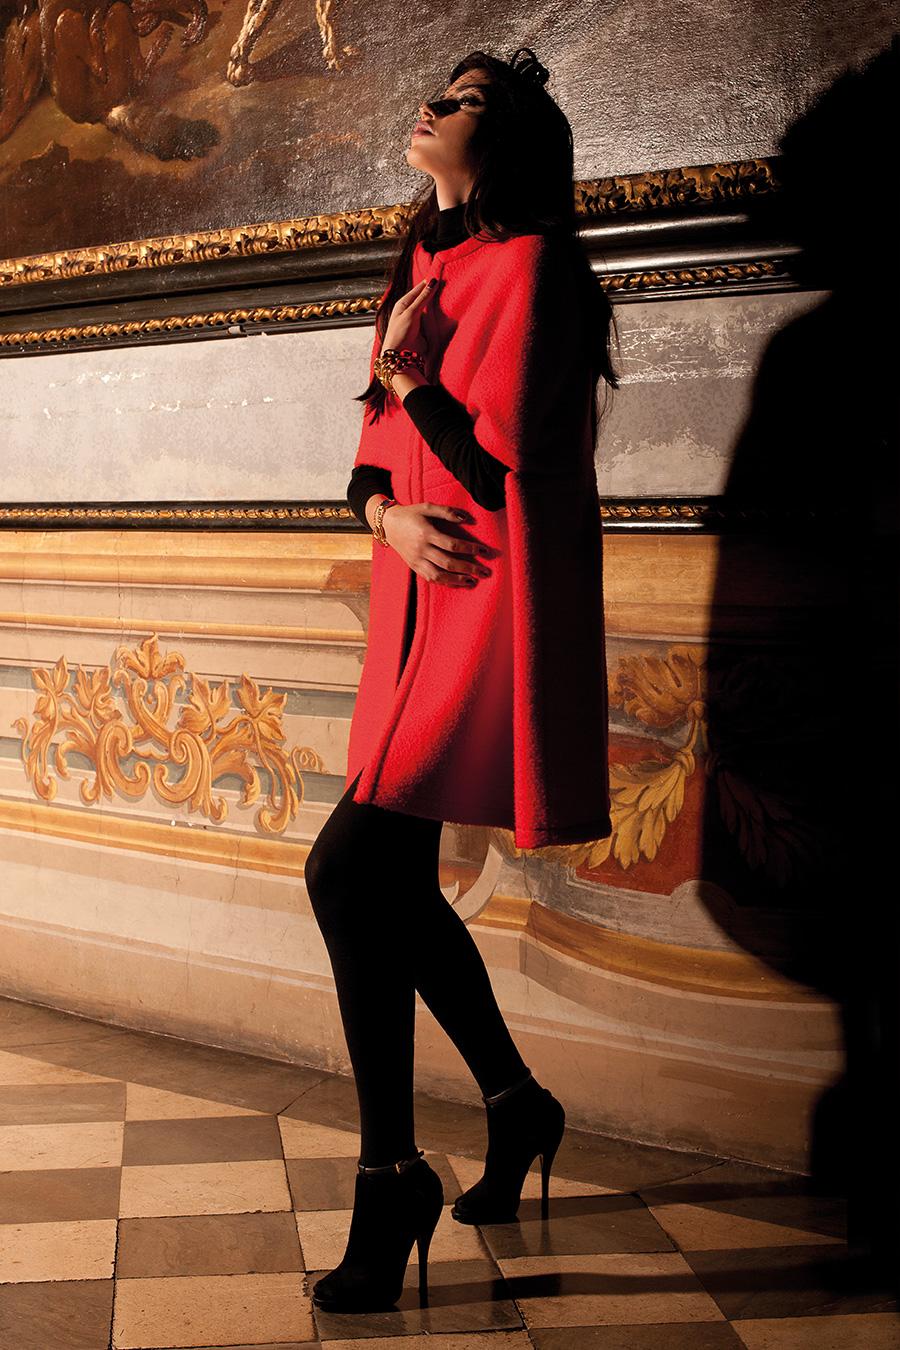 Fashion editorial - Palazzo taverna